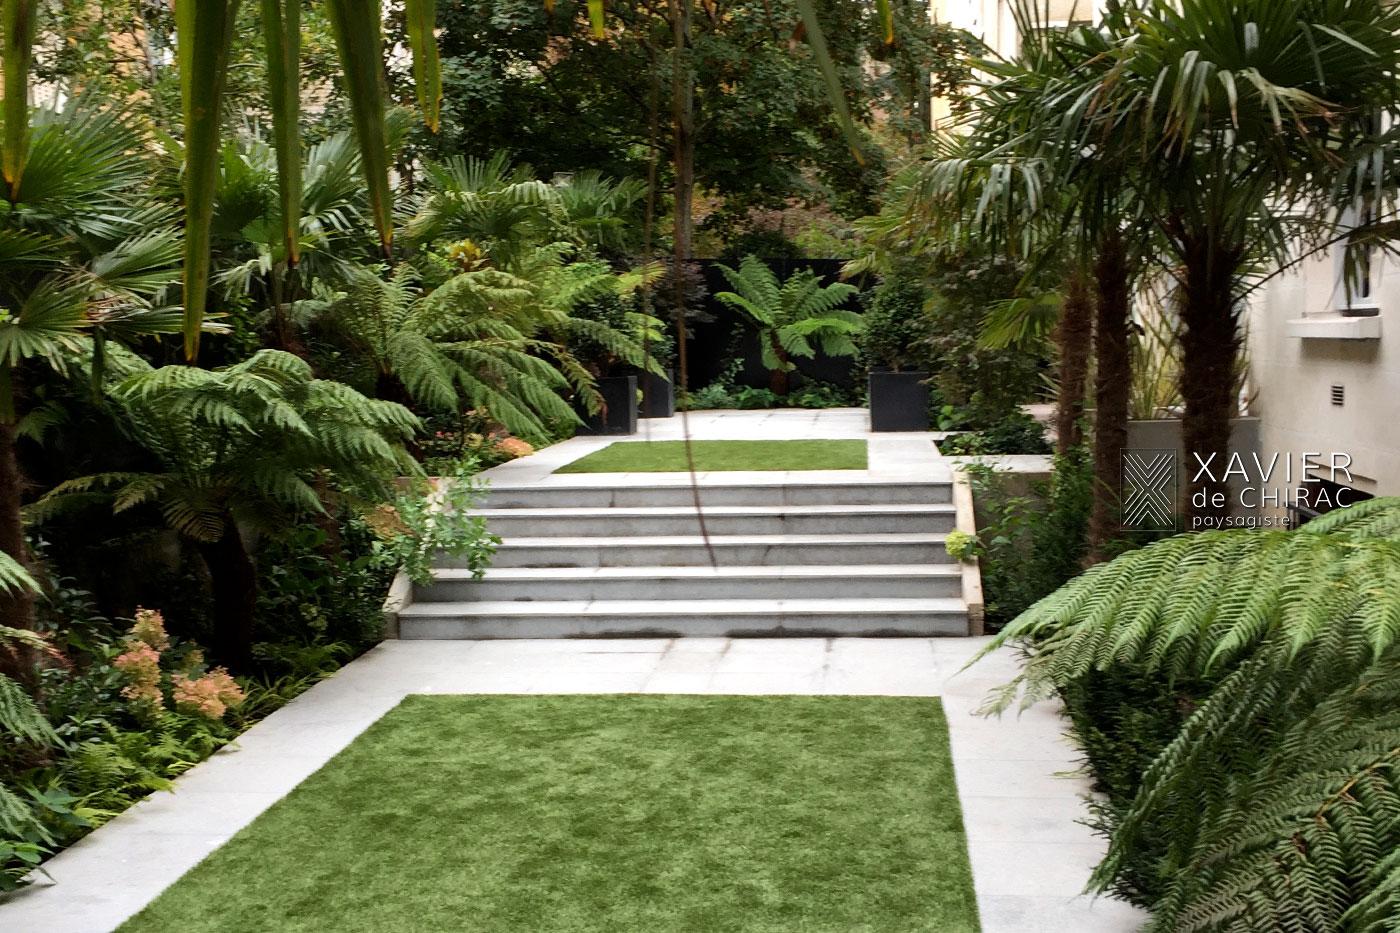 xavier de chirac terrasse noire xavier de chirac structurer son jardin new cration d un jardin. Black Bedroom Furniture Sets. Home Design Ideas